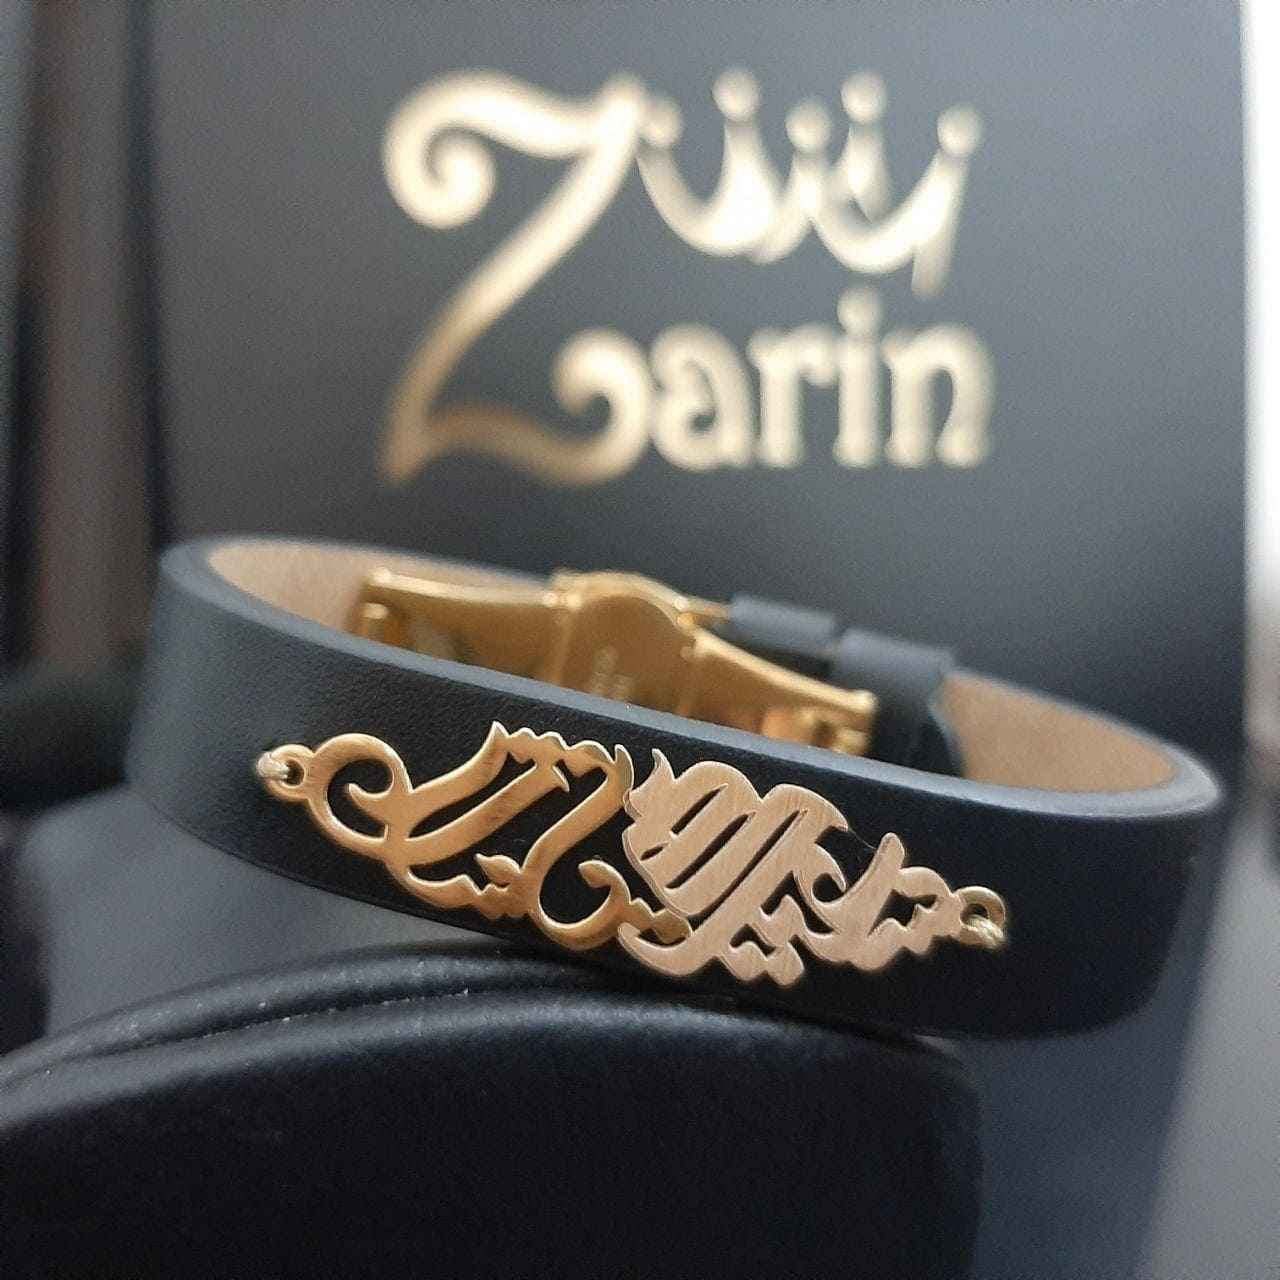 دستبند طلا دو اسم ترکیبی سعیده یاشار